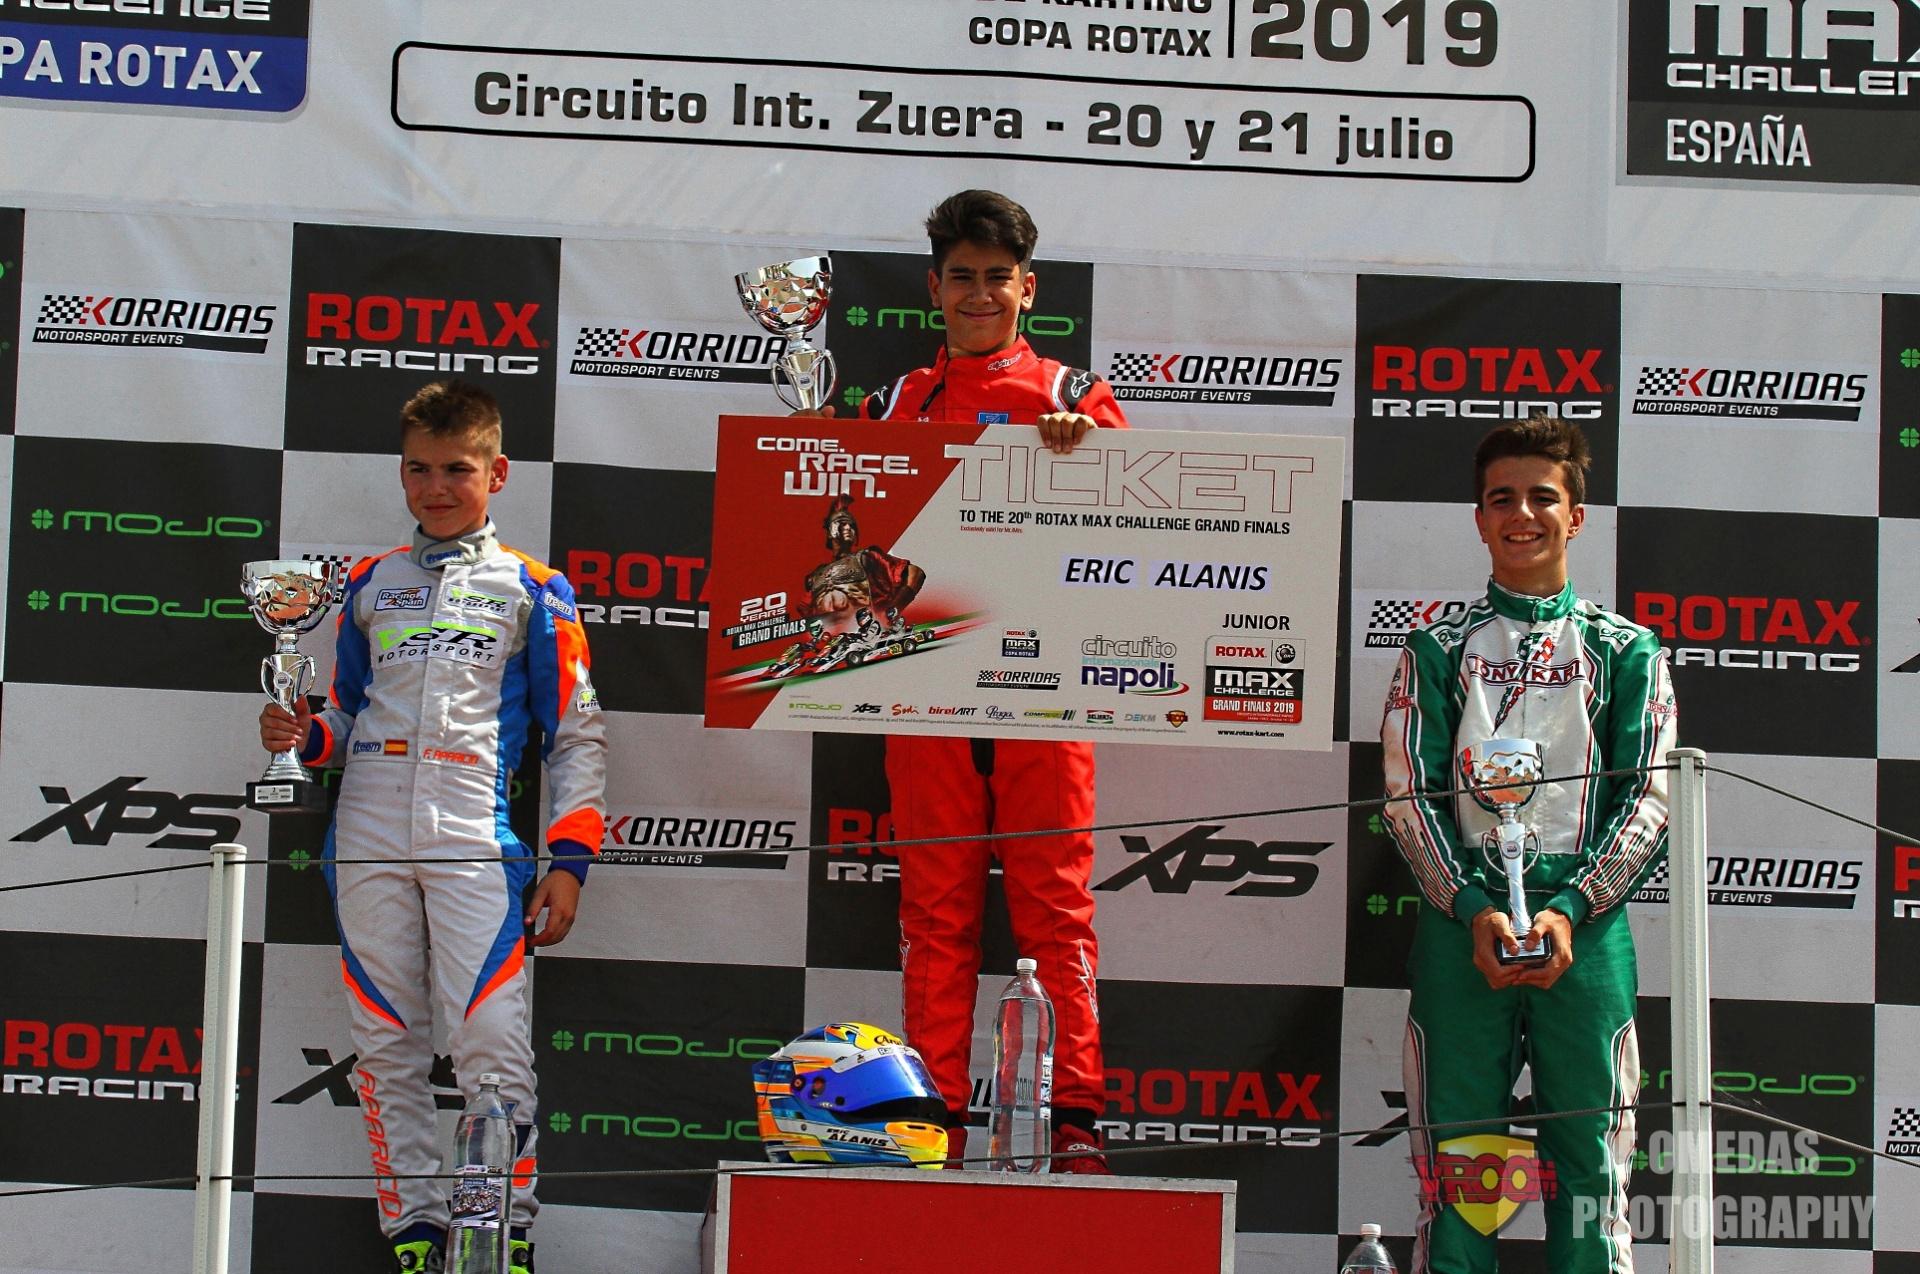 Copa Rotax Junior - Eric Alanis campeón